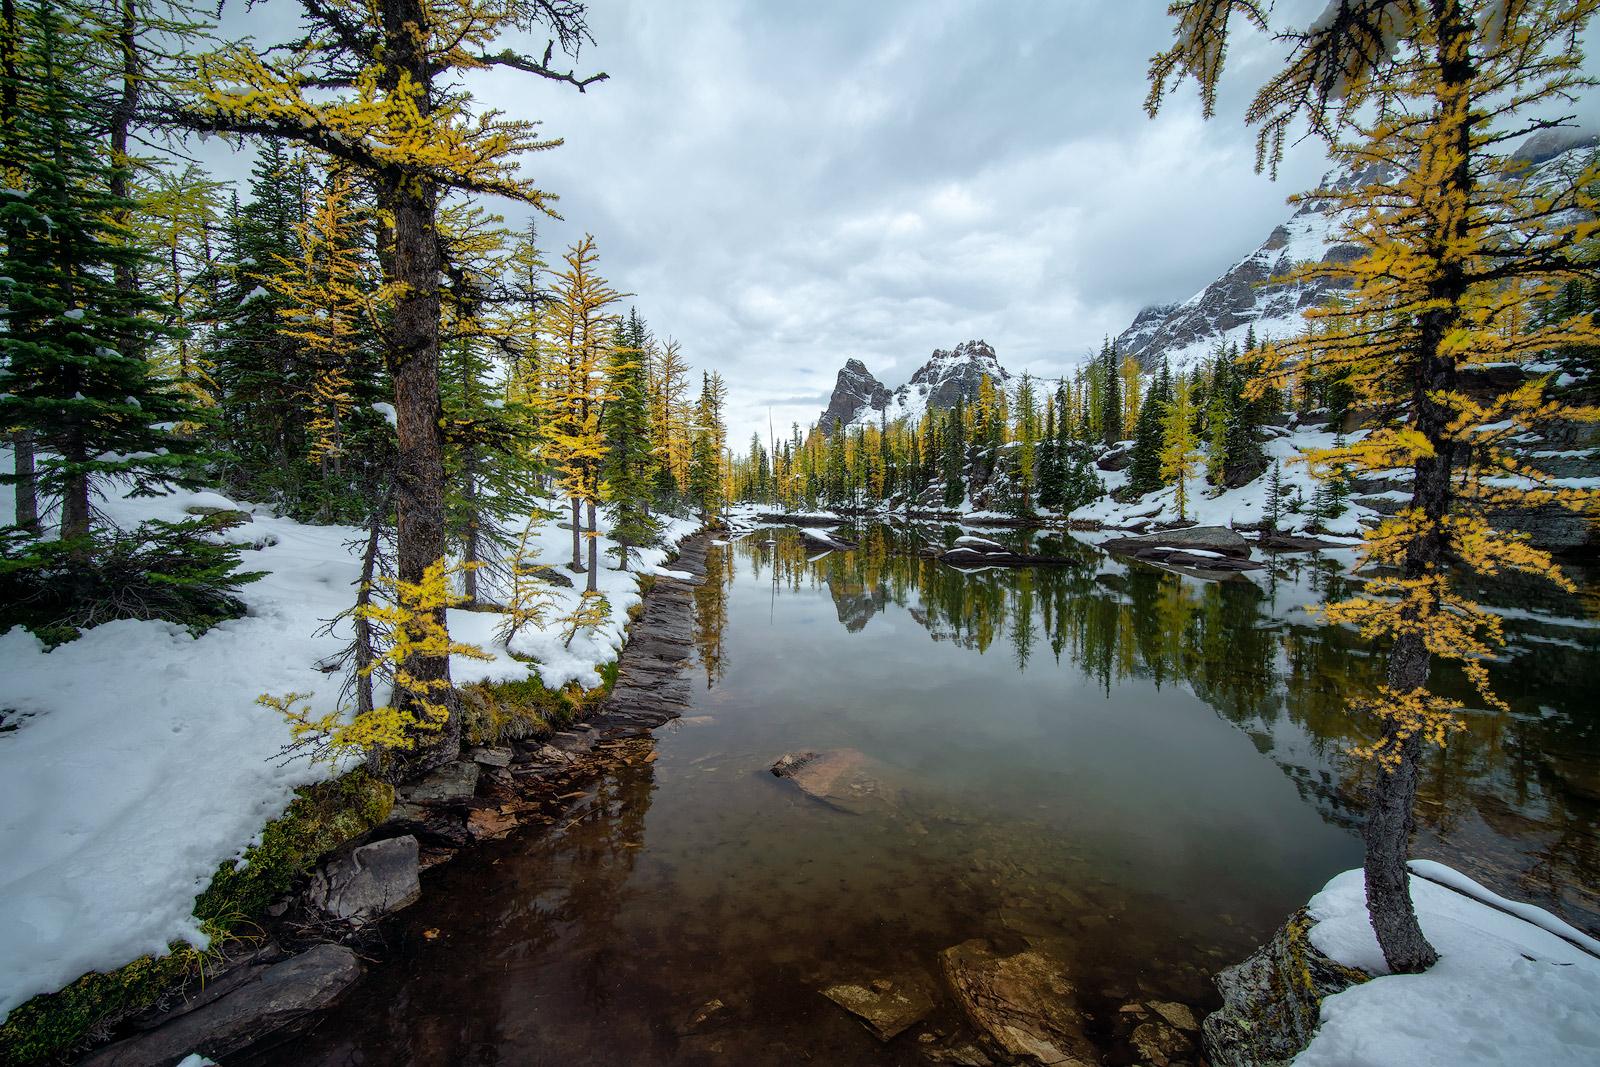 Canada, Glacier, Alberta, Banff, Moraine Lake, Canadian Rockies, Lake Louise, Jasper National Park, Rocky Mountains, Lake Minnewanka, Icefields Parkway, Banff National Park, Lake O'Hara, photo